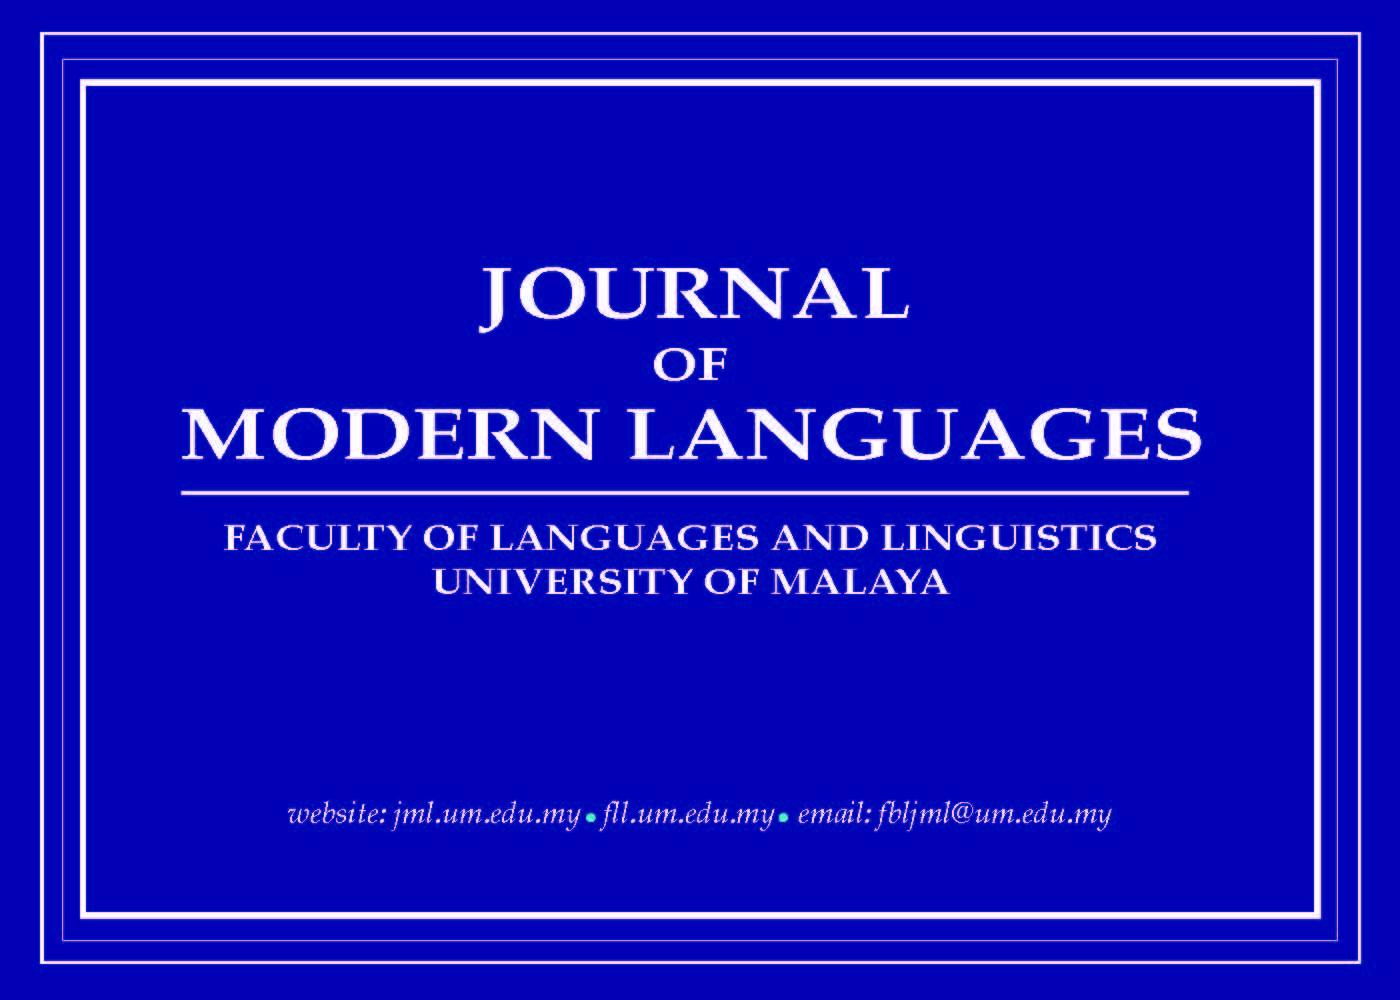 Journal of Modern Languages